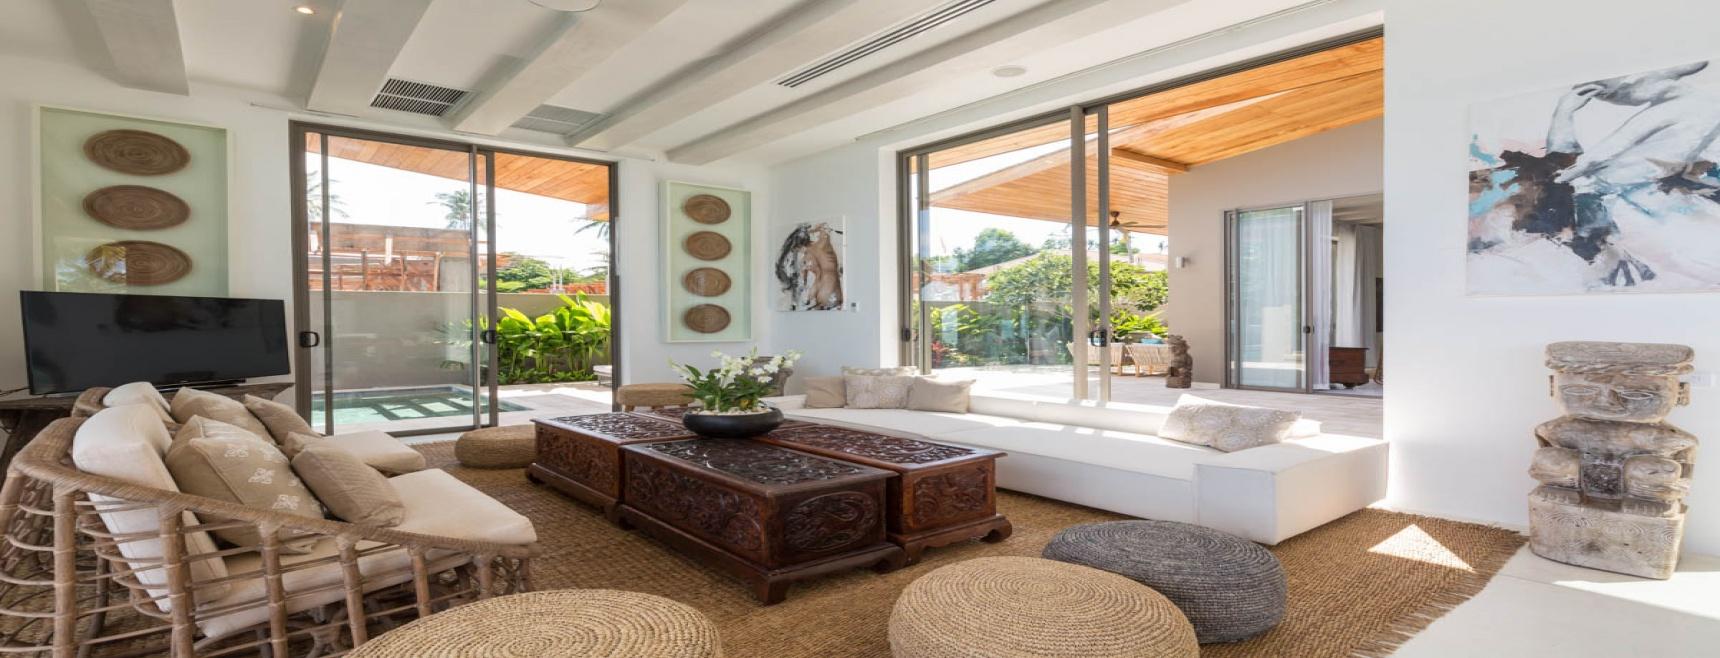 Beach Villa For Sale Koh Samui, Villa Kirana (Thai-Real.com)